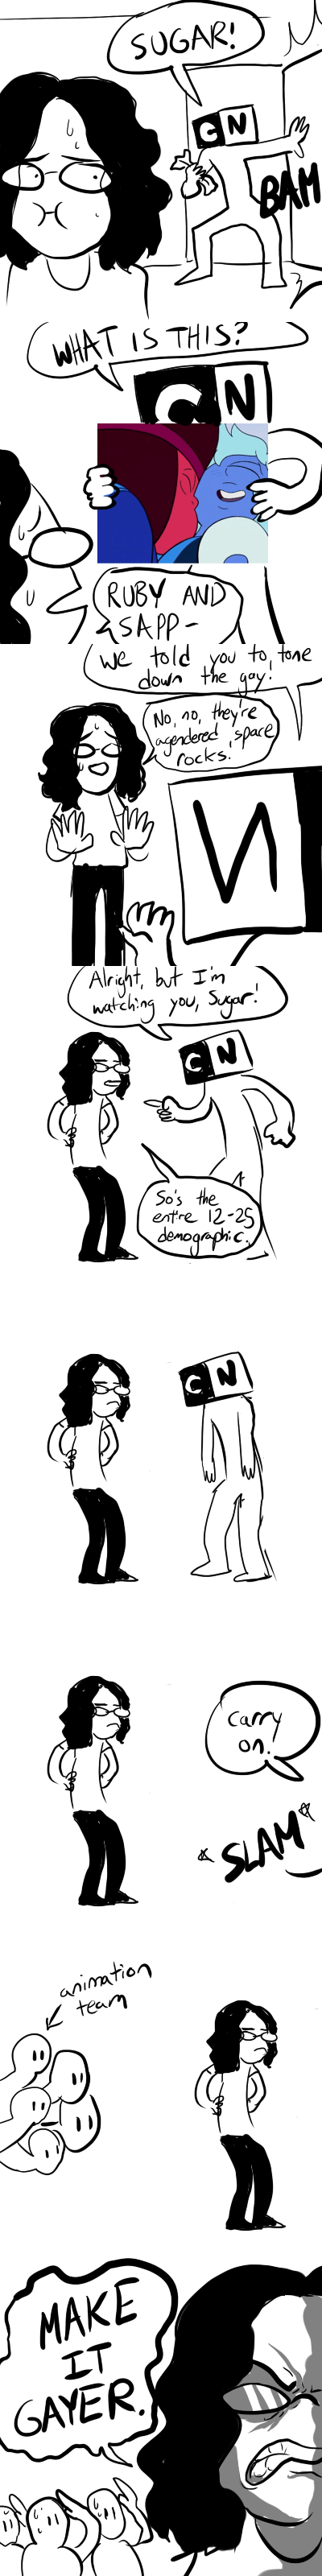 cartoons,steven universe